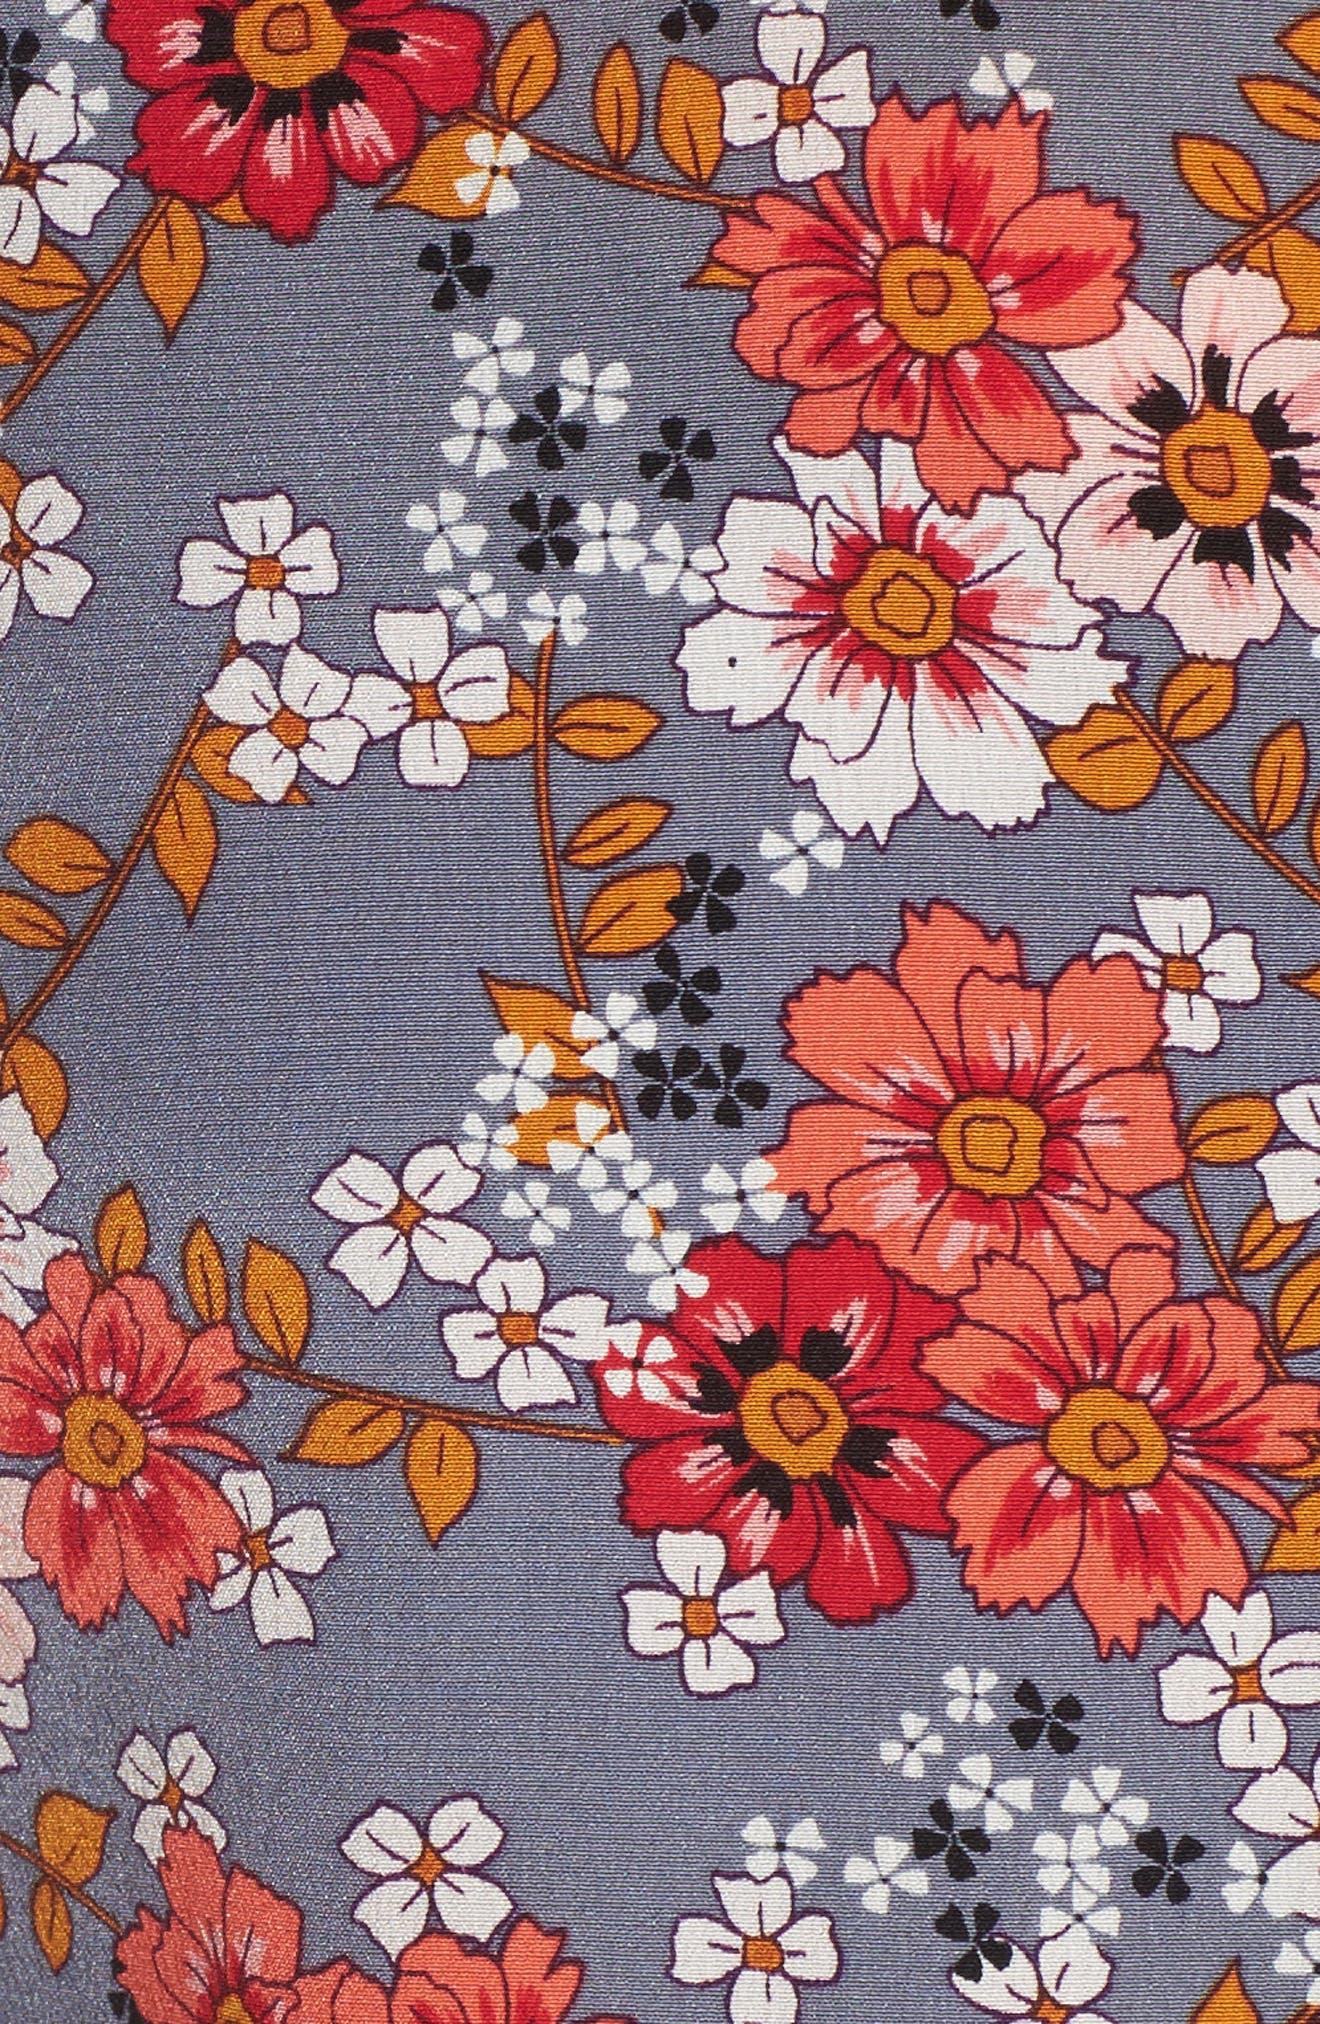 Larchmont Blooms Silk Shirtdress,                             Alternate thumbnail 5, color,                             Slate Swirl Larchmonth Blooms